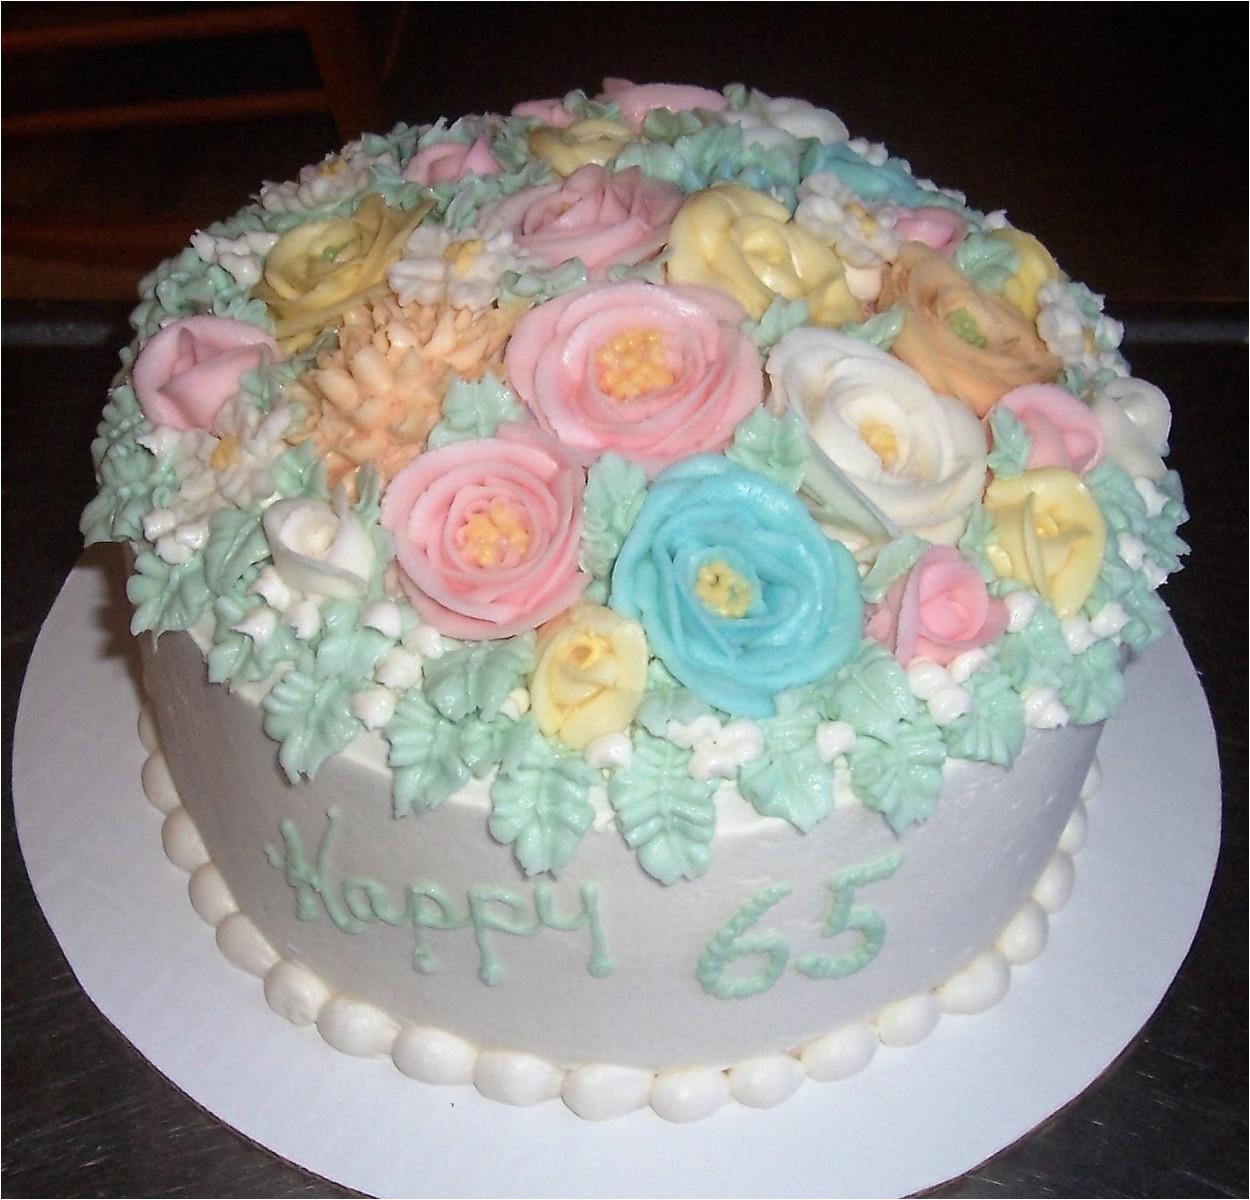 65th birthday flower cake 2 cake decorating community